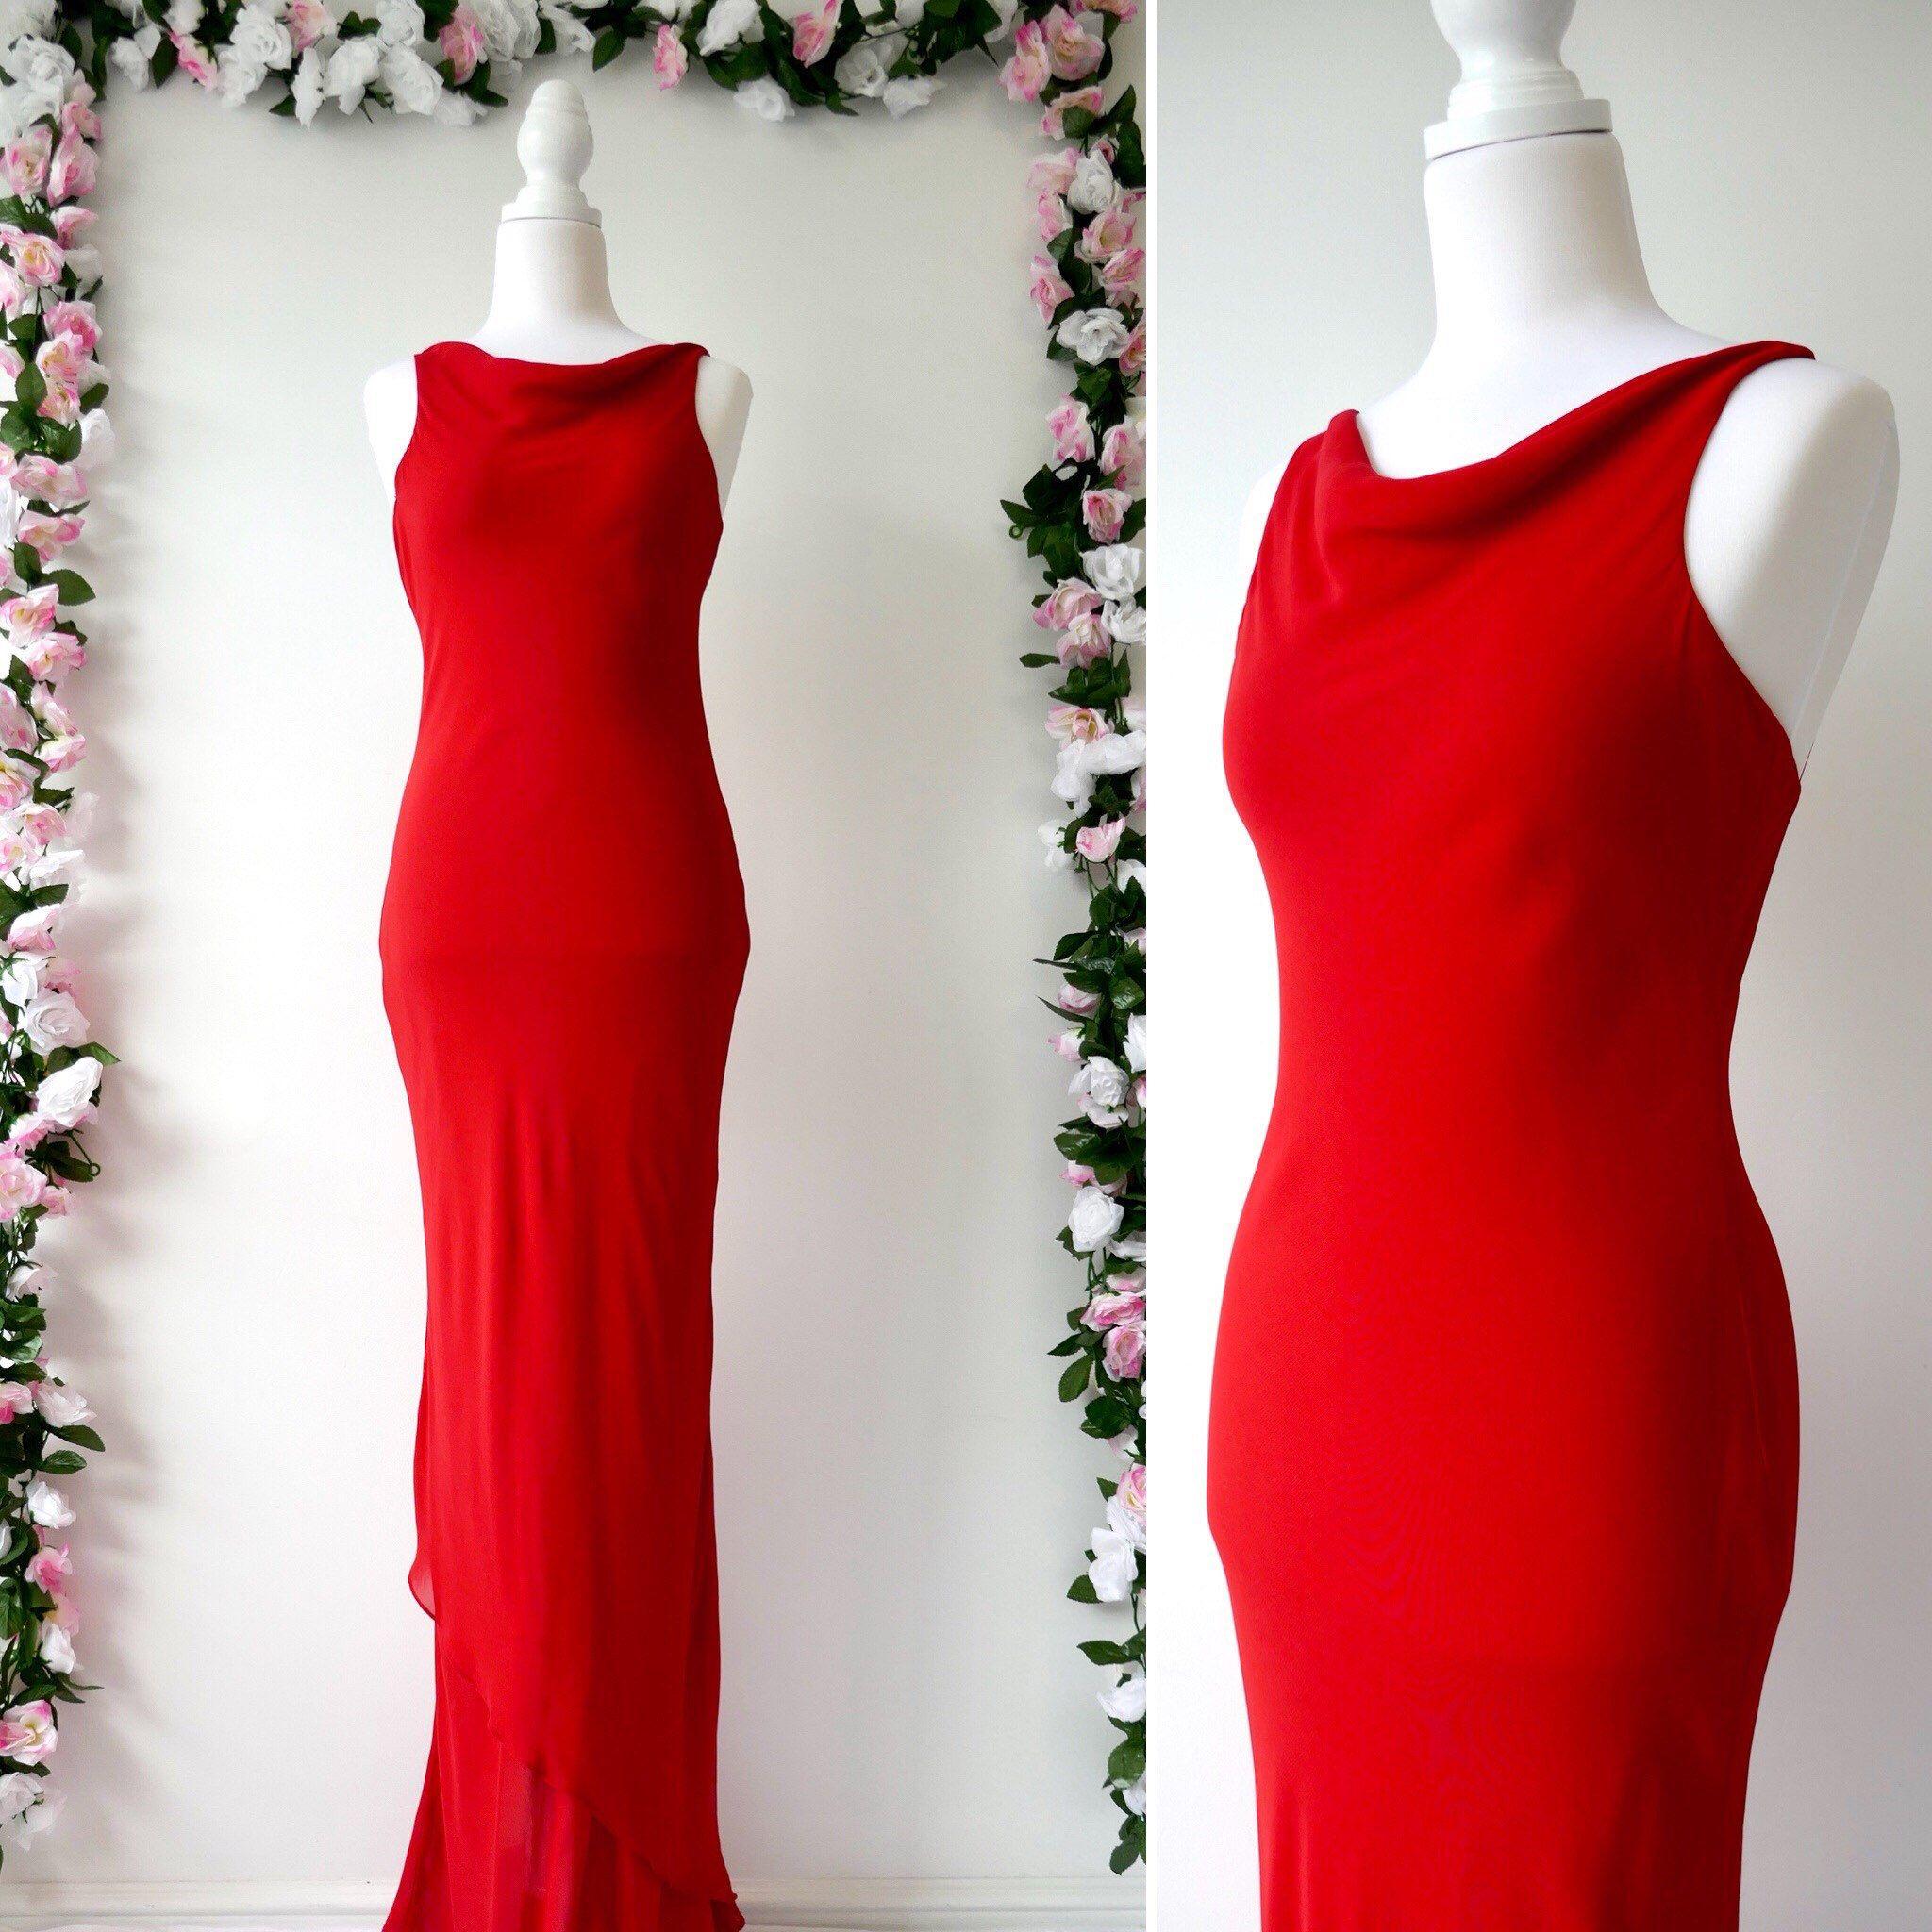 Vintage 90 S Evening Dress 90s Prom Dress Cocktail Etsy Trendy Dresses Formal Long Red Dress Long Cocktail Dress [ 2048 x 2048 Pixel ]